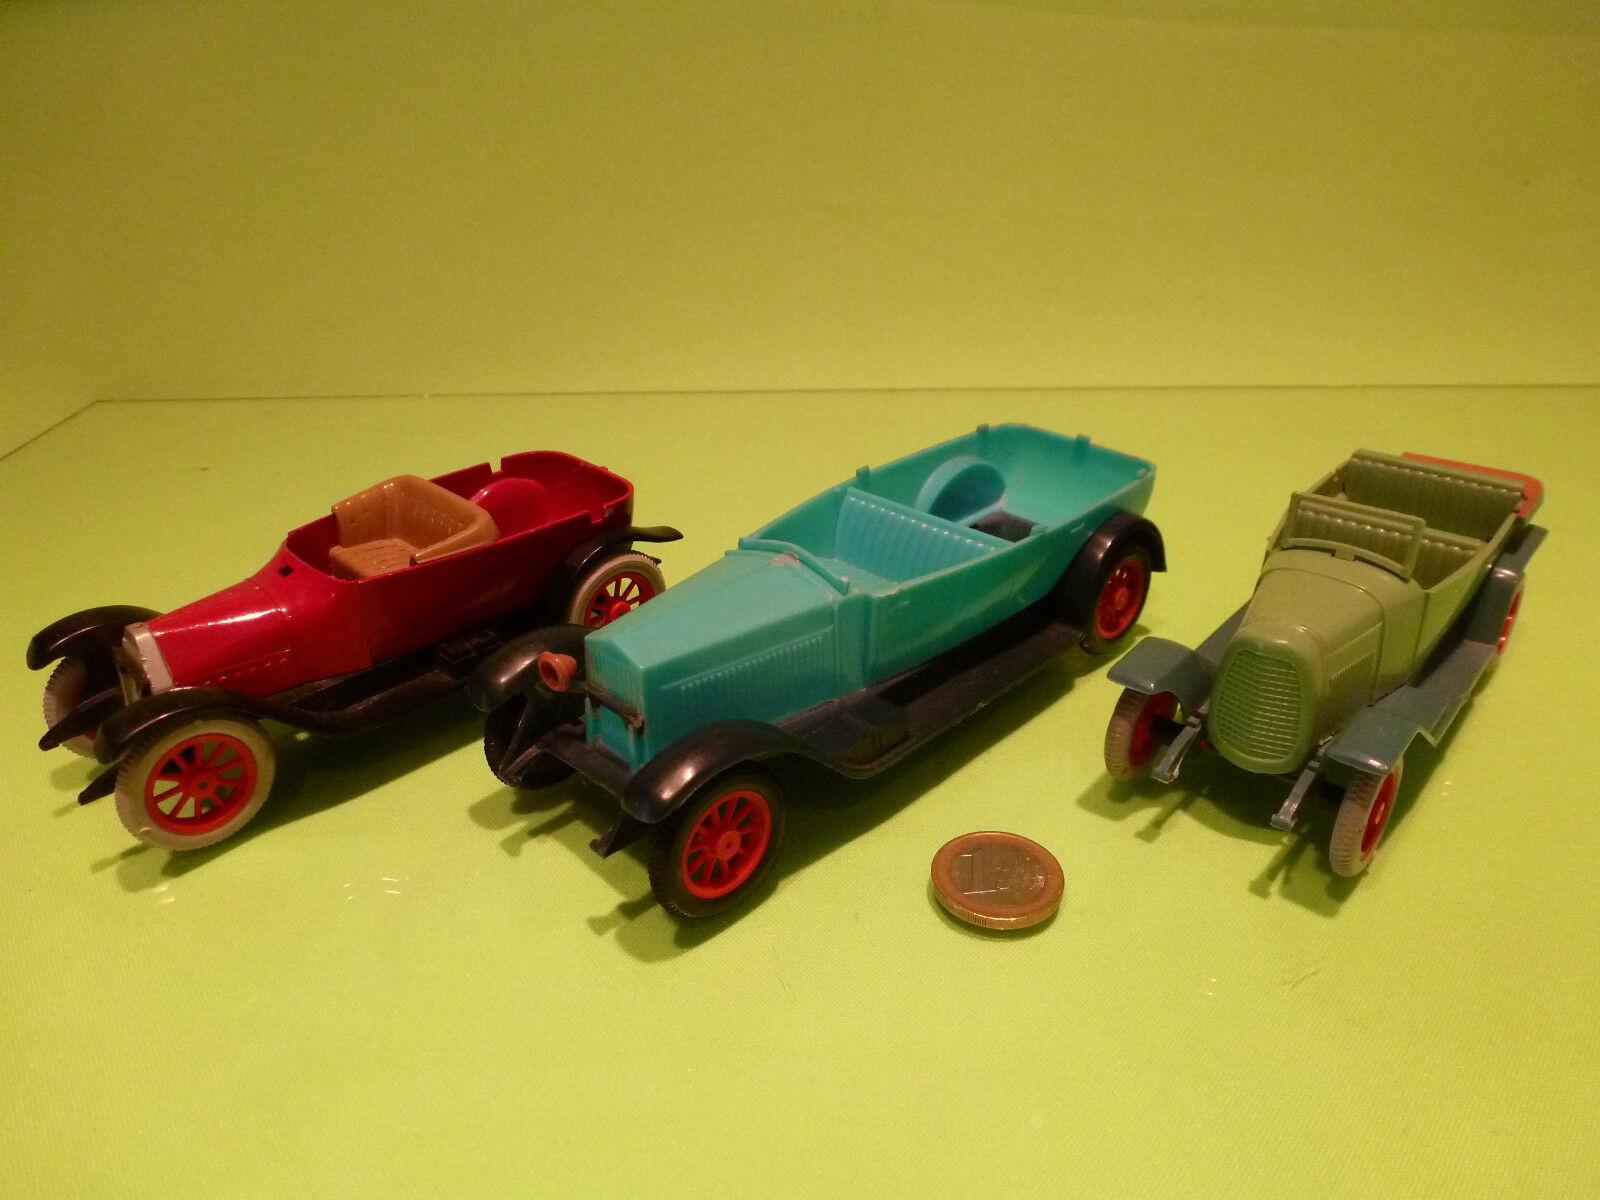 INGAP PLASTIC 3x FIAT 501 1912 519 519 519 - VINTAGE CLASSIC - blueE 1 32 - PLASTIK a1712a